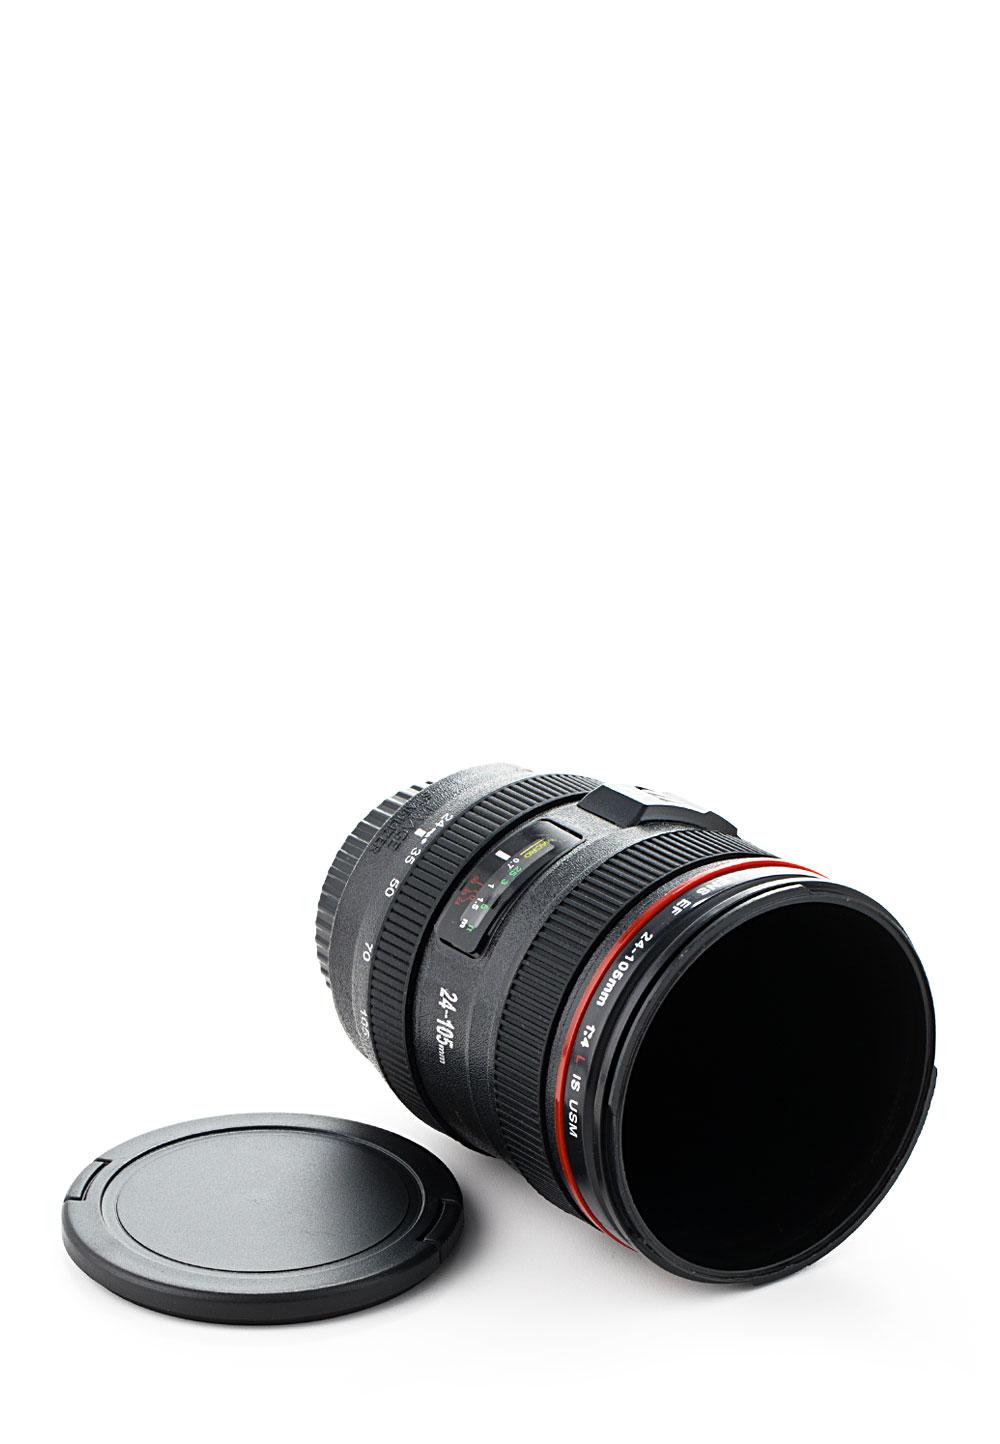 mug zoom photo canon tasse objectif cadeau super insolite. Black Bedroom Furniture Sets. Home Design Ideas